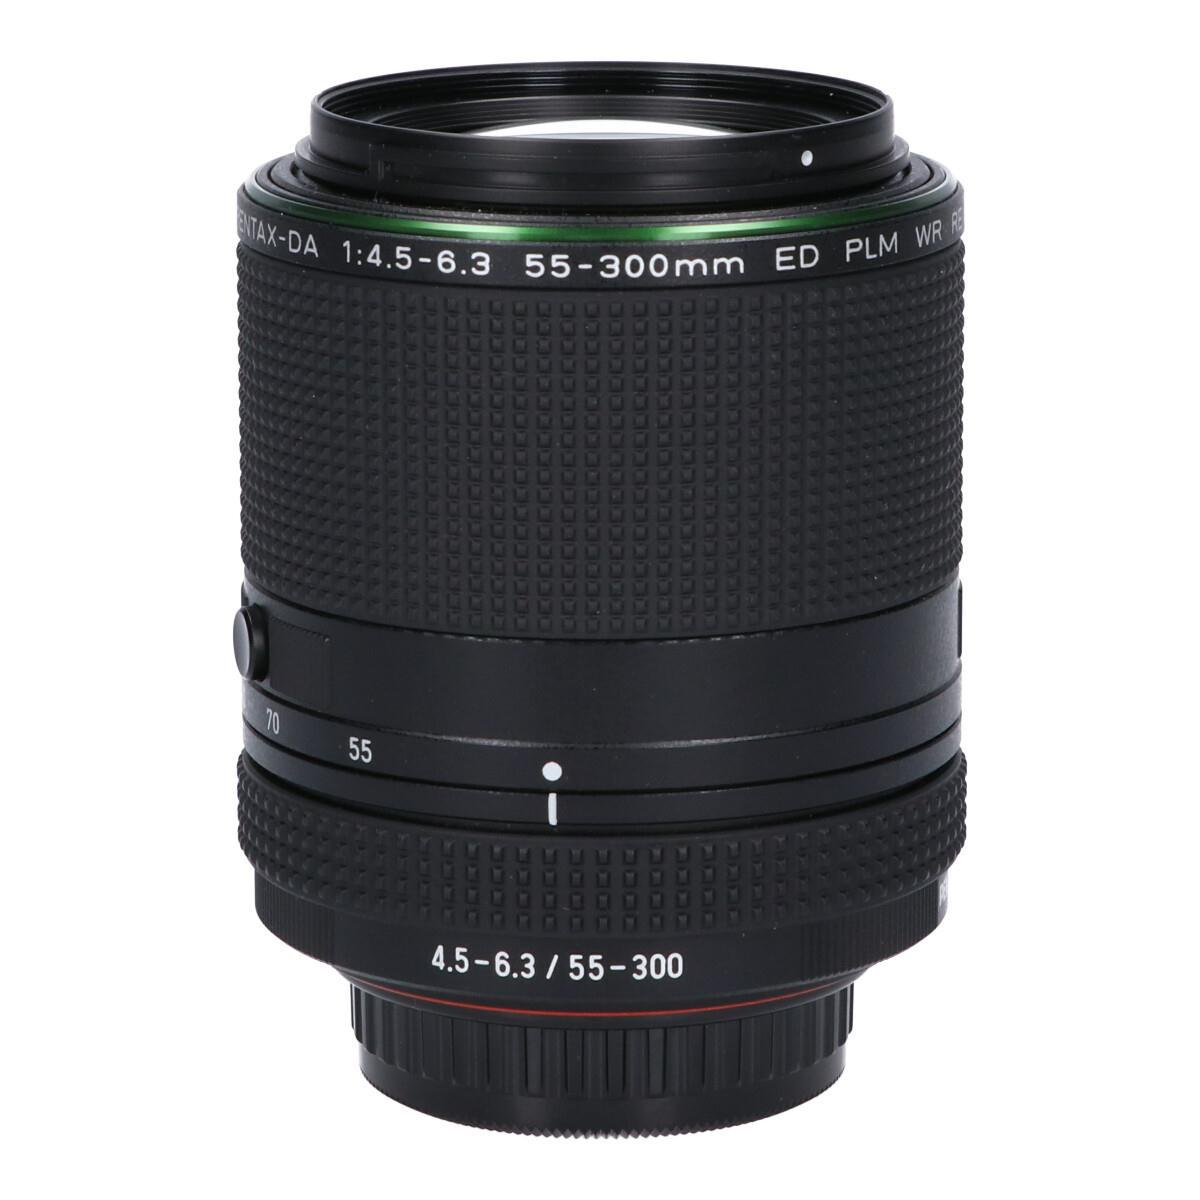 PENTAX DA55-300mm F4.5-6.3ED PLM【中古】